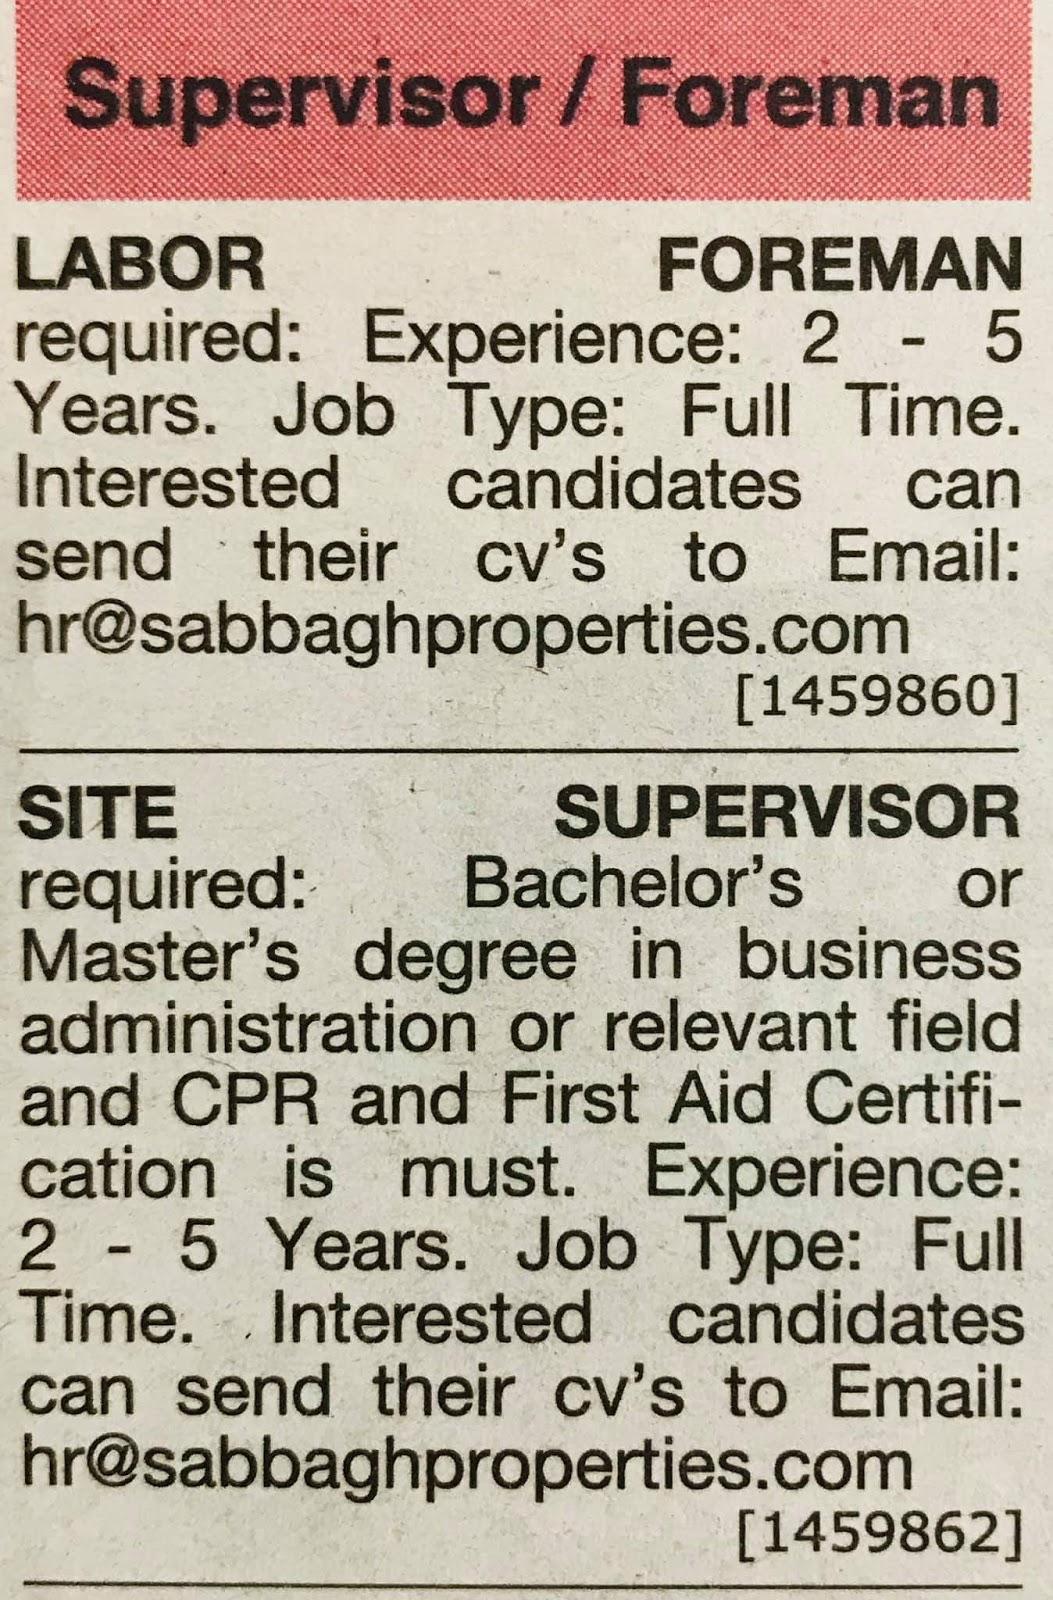 Required Foreman & Site Supervisor for UAE Local Hiring JOBS Khaleej